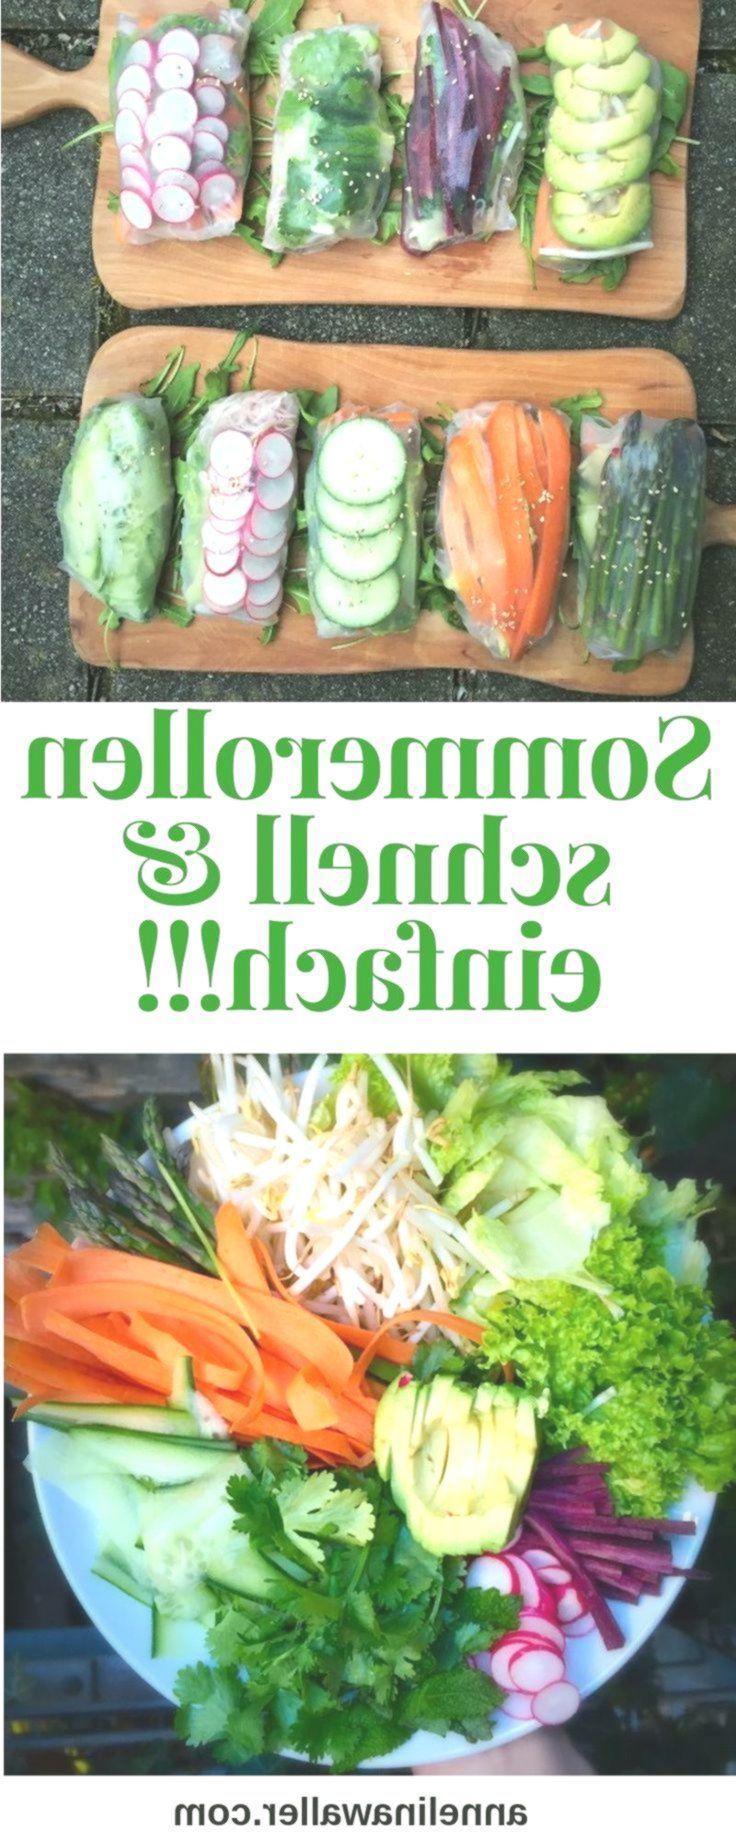 vegane rezepte deutsch, vegane rezepte Mittag, vegane rezepte schnell, vegane re... - #deutsch #Mittag #Rezepte #schnell #vegane #veganerezeptemittag vegane rezepte deutsch, vegane rezepte Mittag, vegane rezepte schnell, vegane re... - #deutsch #Mittag #Rezepte #schnell #vegane #veganerezeptemittag